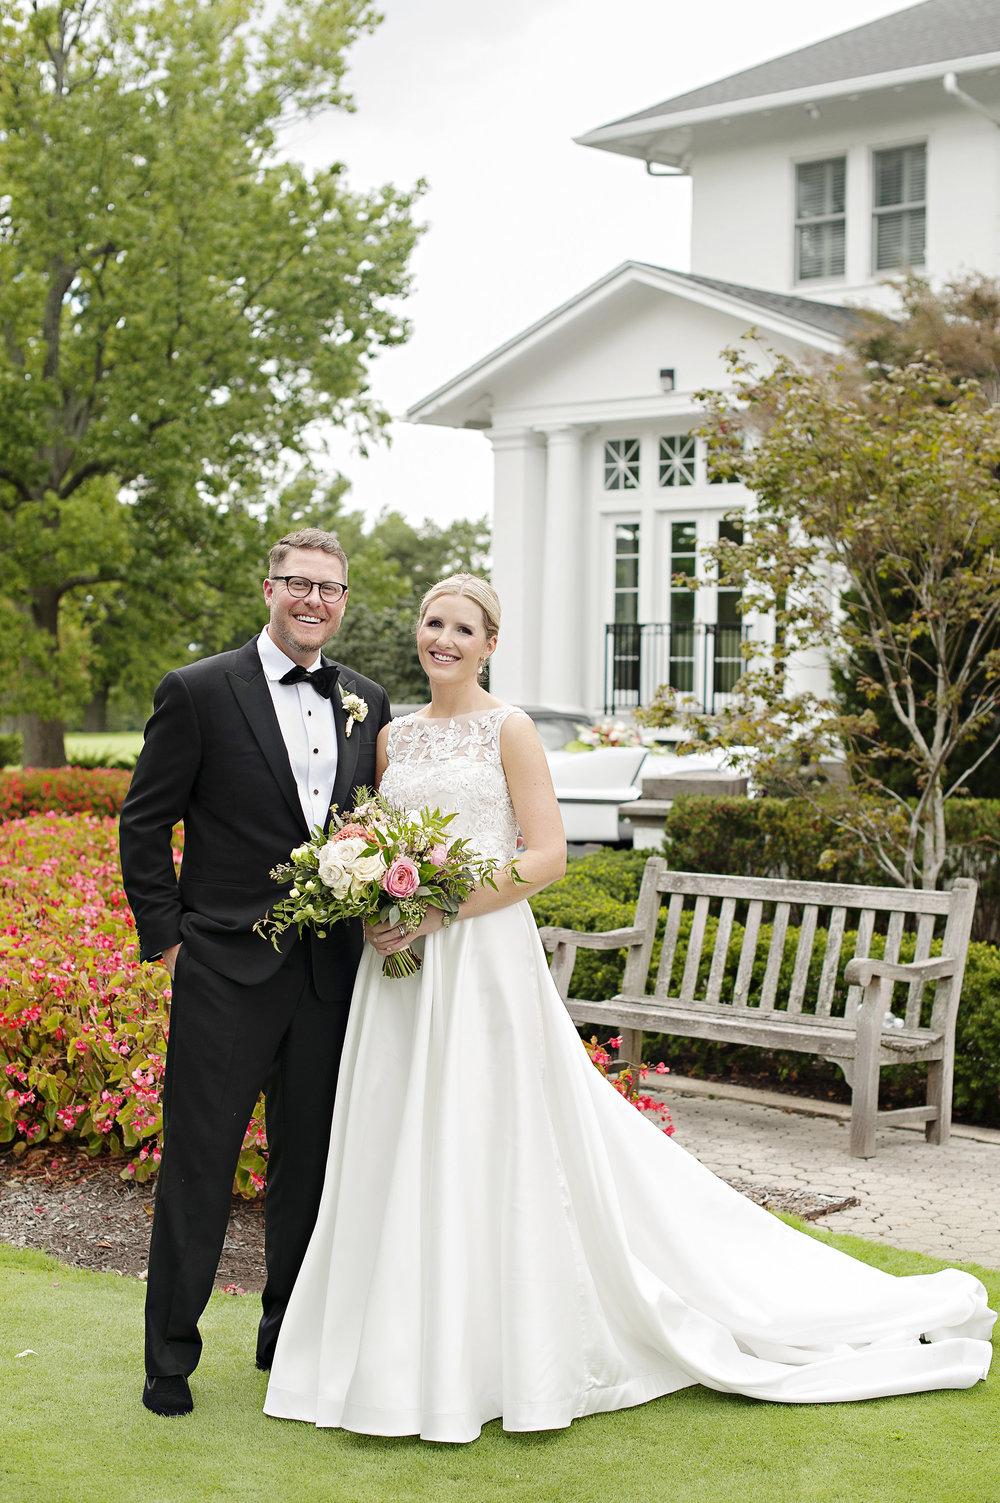 Kalnow_Wedding_144.jpg